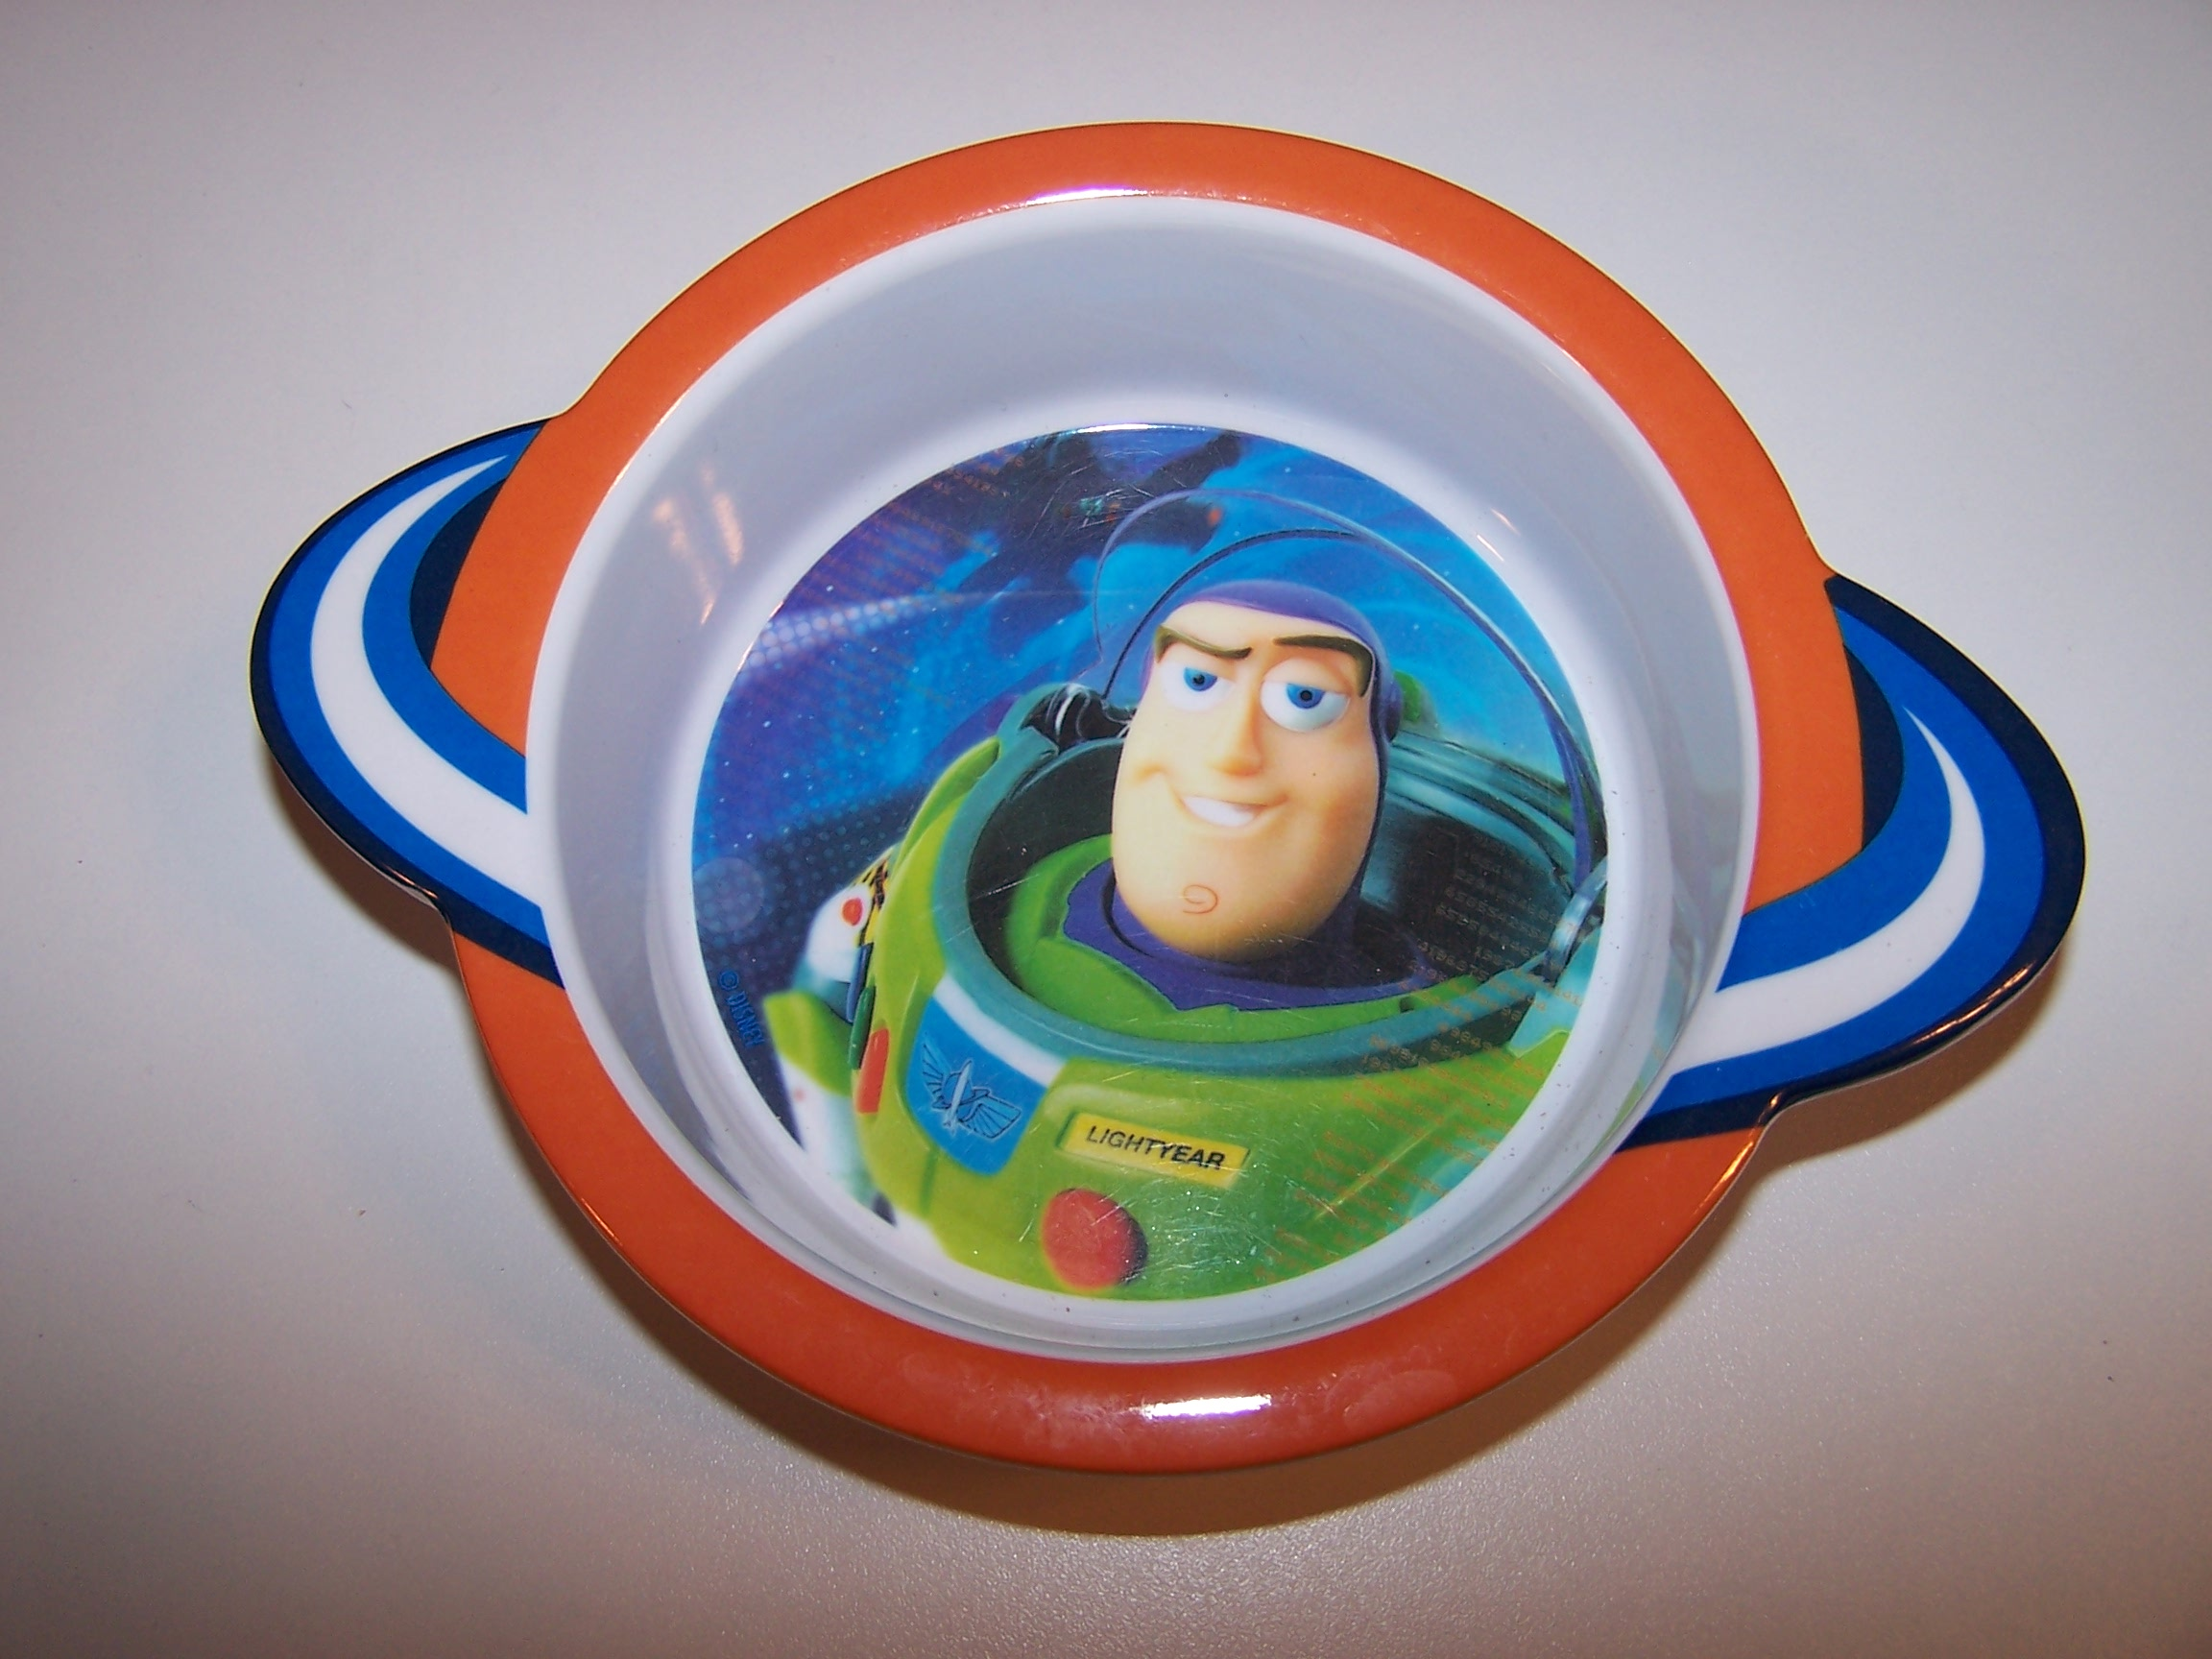 Buzz Lightyear Cereal Bowl, Child Size, Plastic, Disney